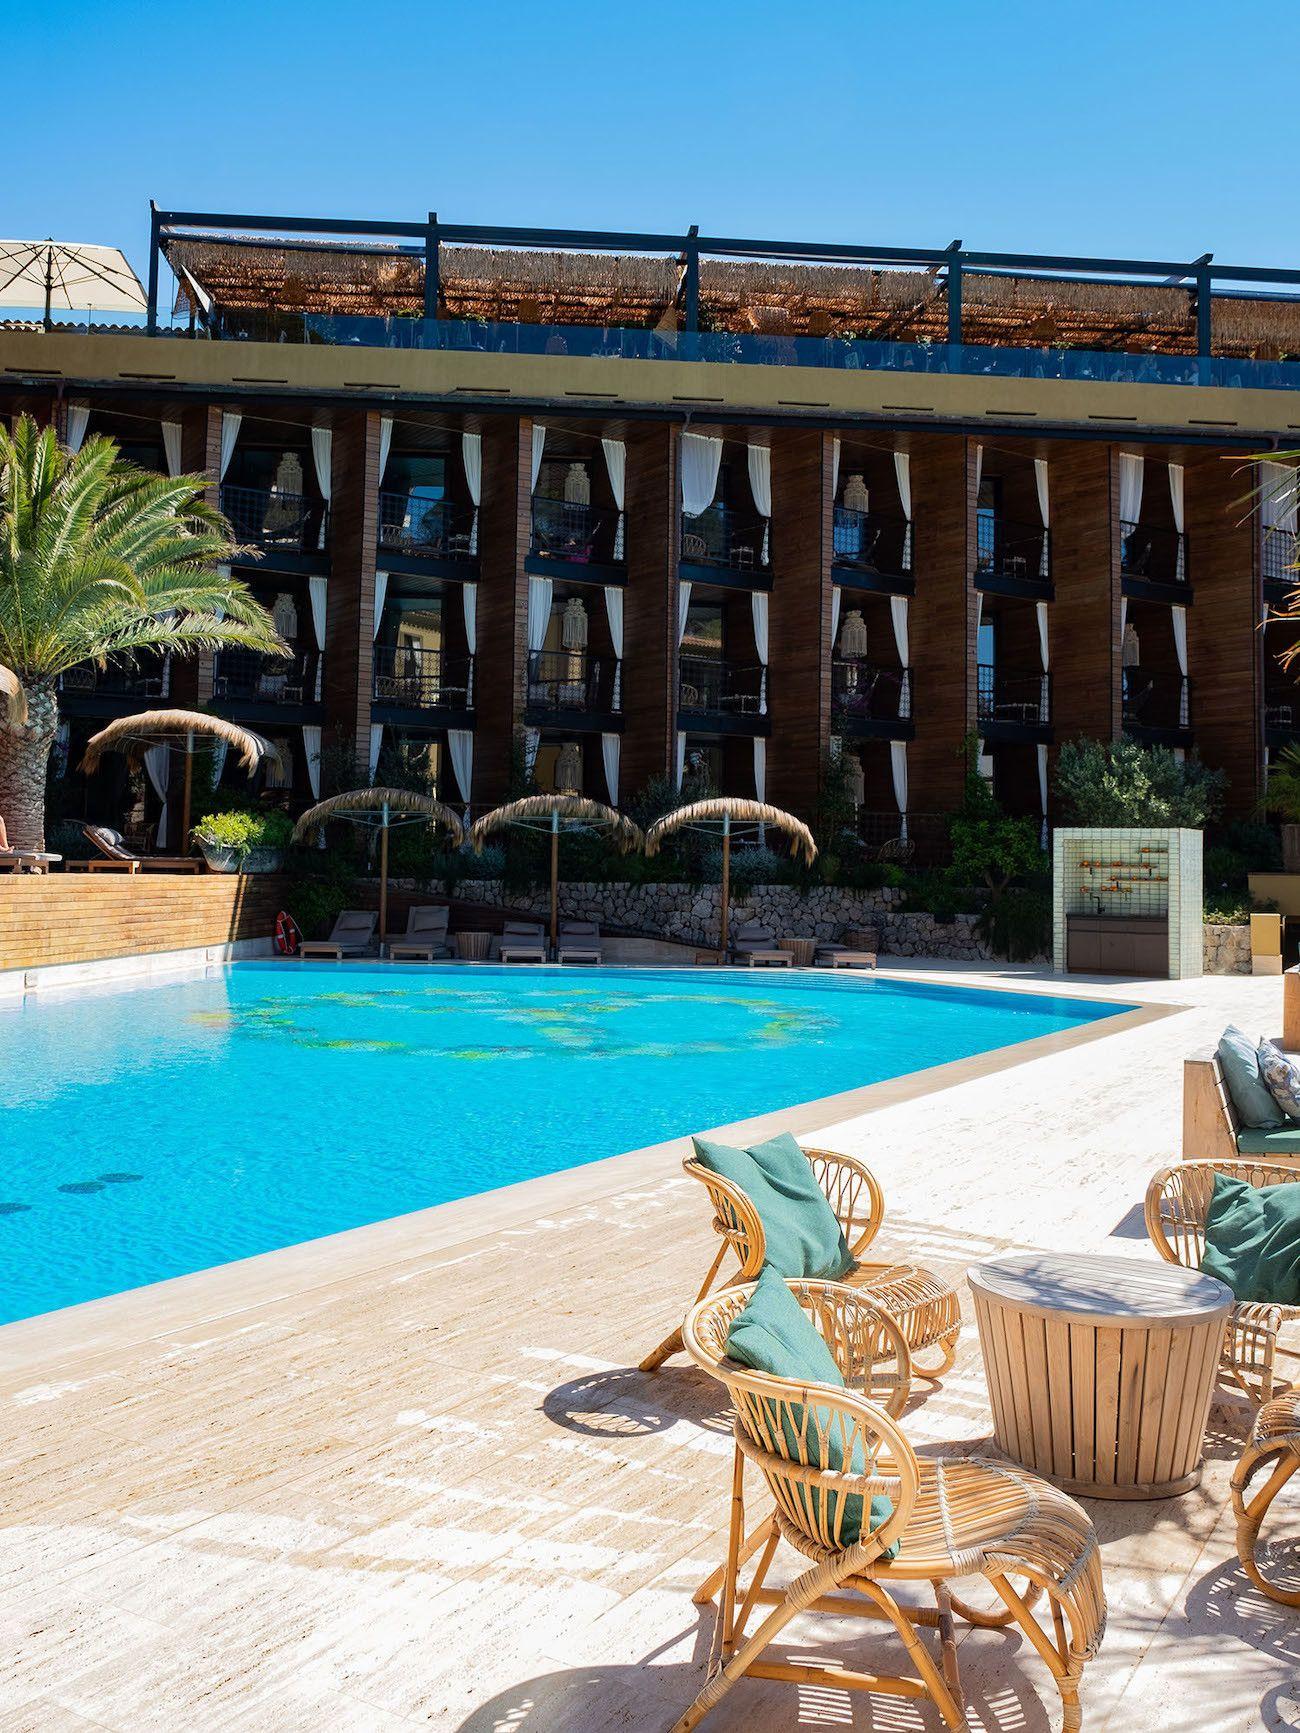 Foodblog About Fuel, Bikini Island & Mountain Hotels, Poolbereich